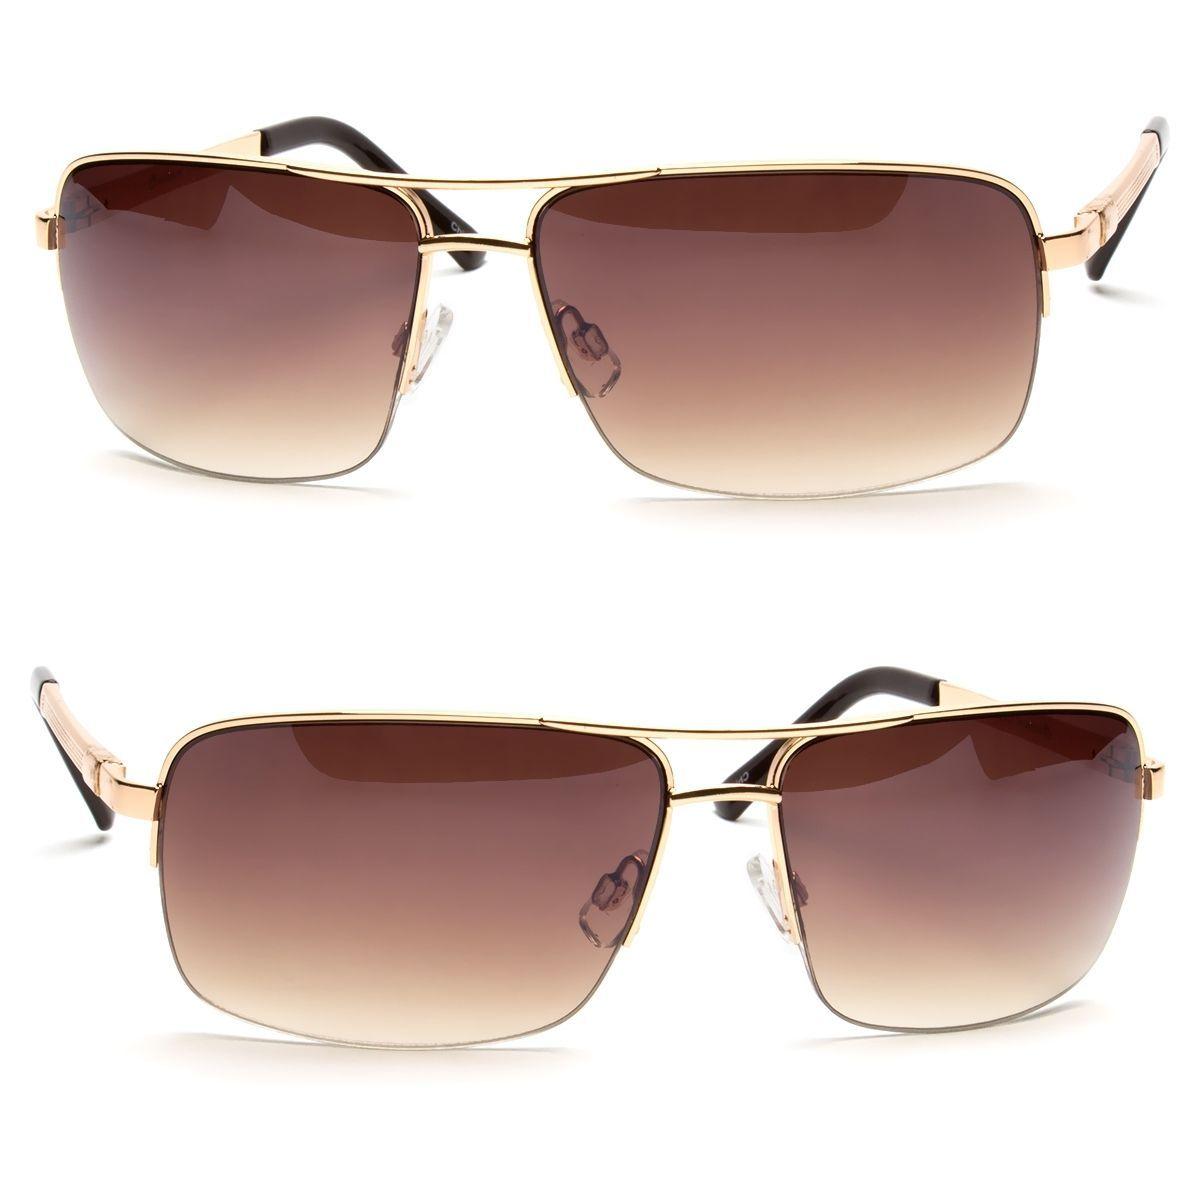 bb820450e709 Classic Retro Mens Fashion Metal Aviators Vintage Designer Sunglasses Black  l